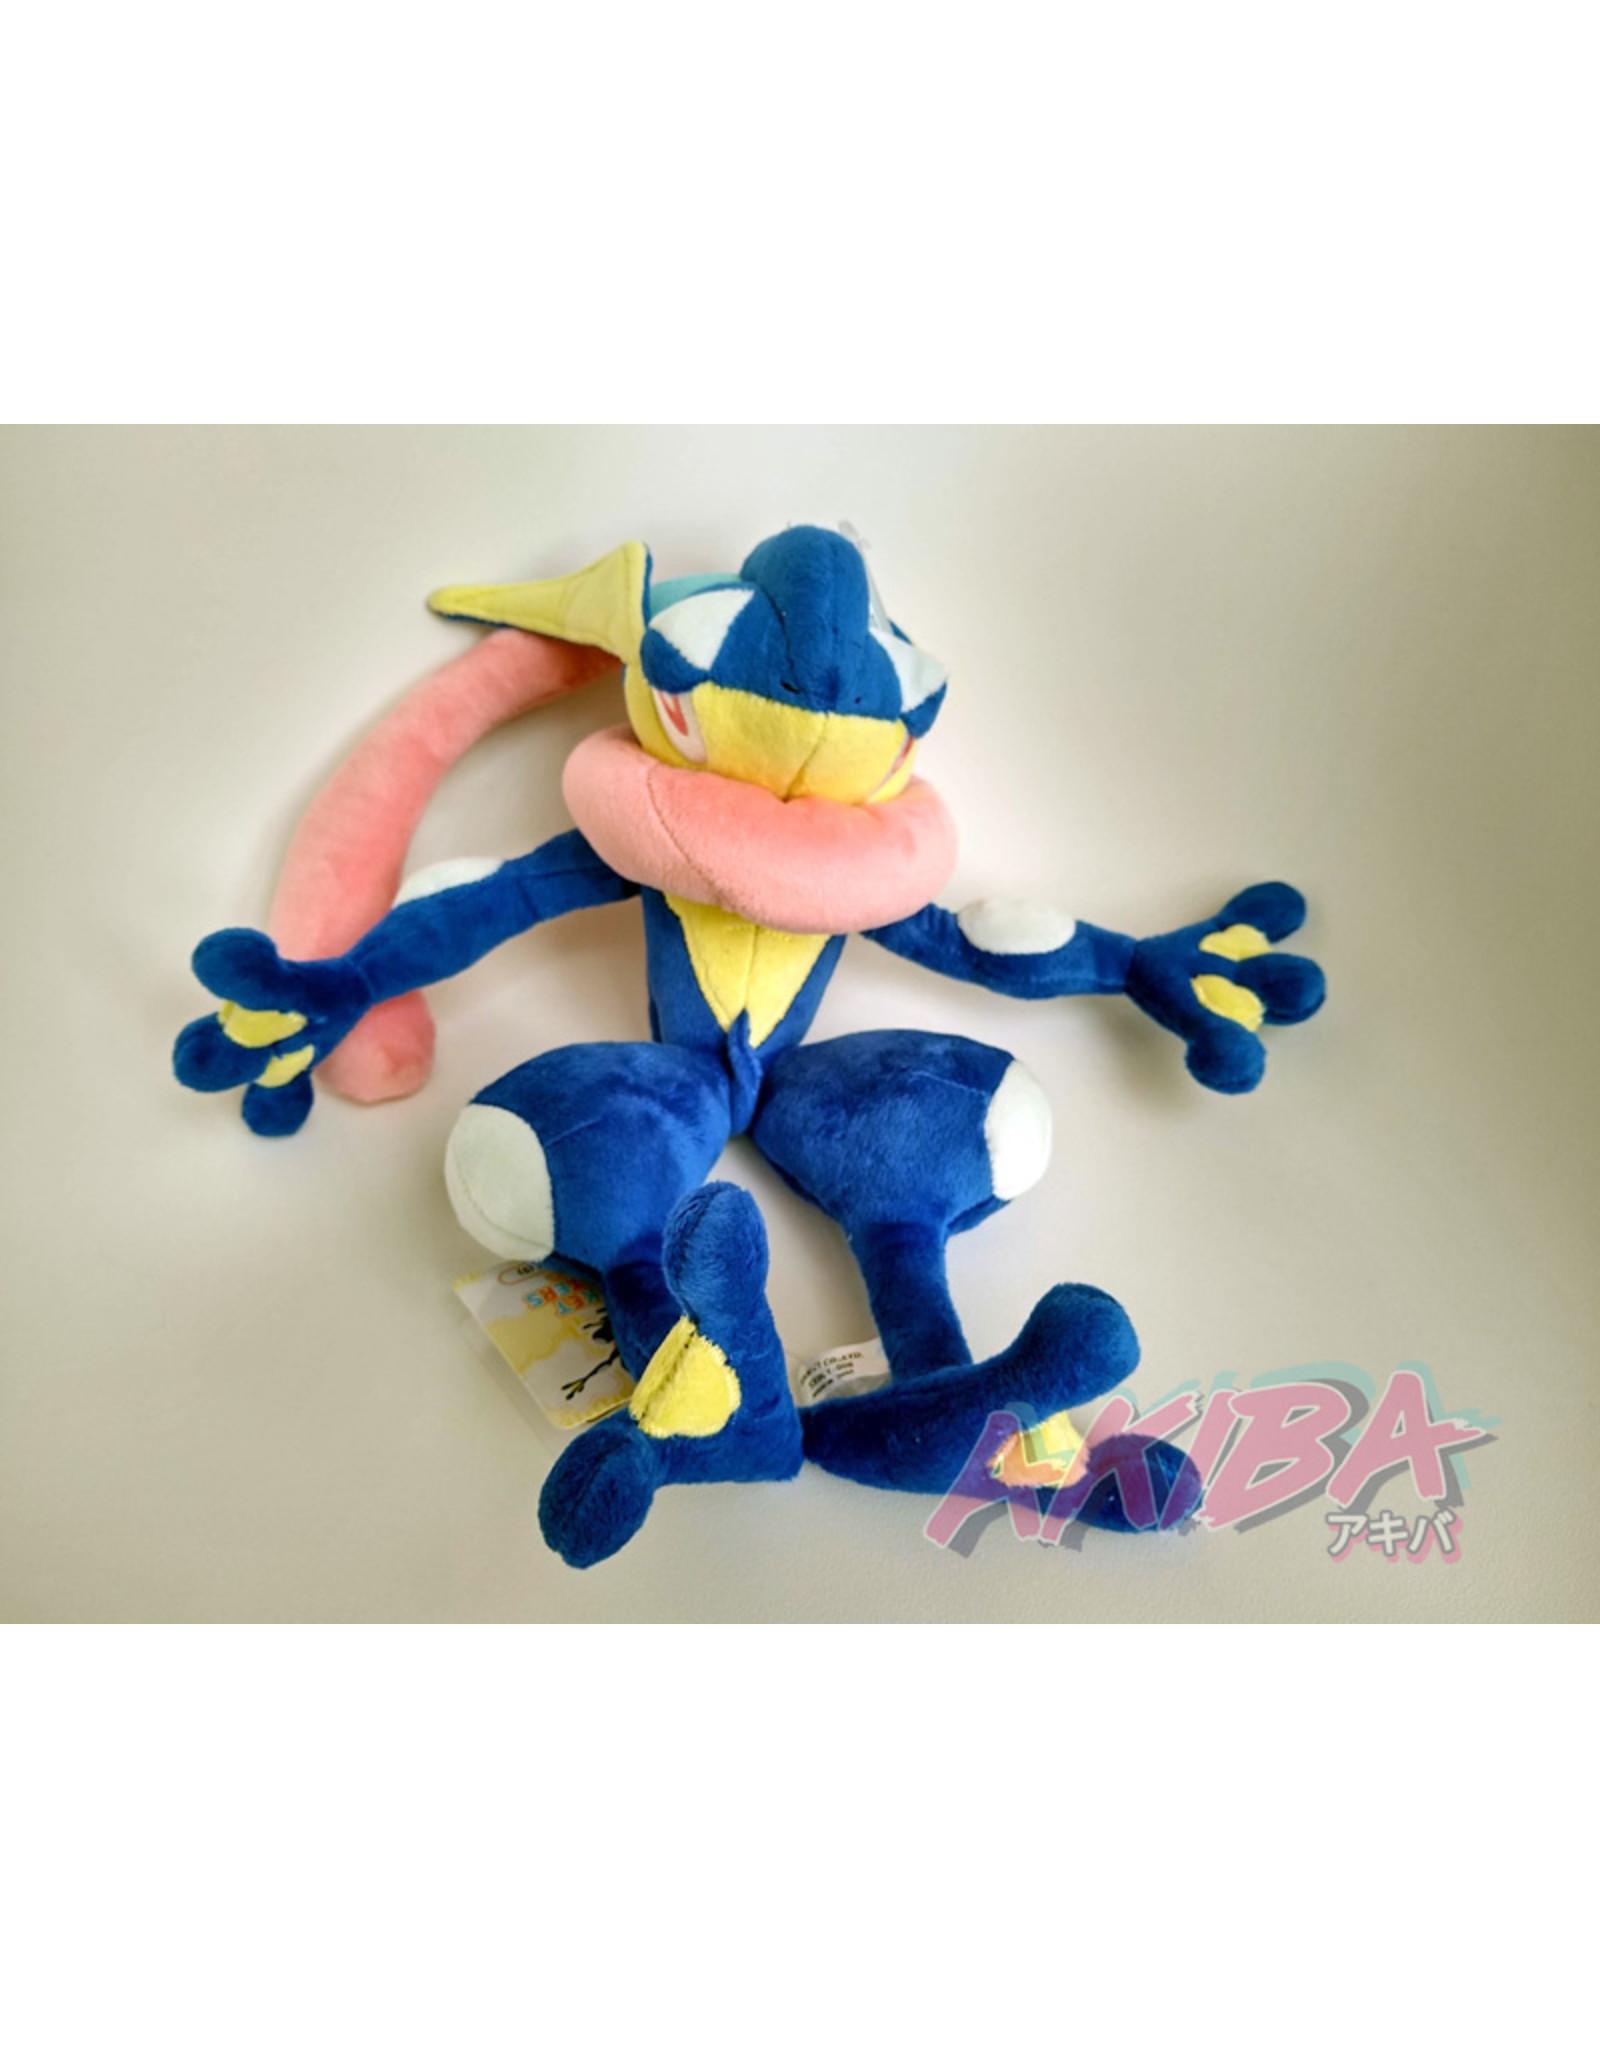 Greninja - Pokemon Plushie - 26cm (Japanese import)